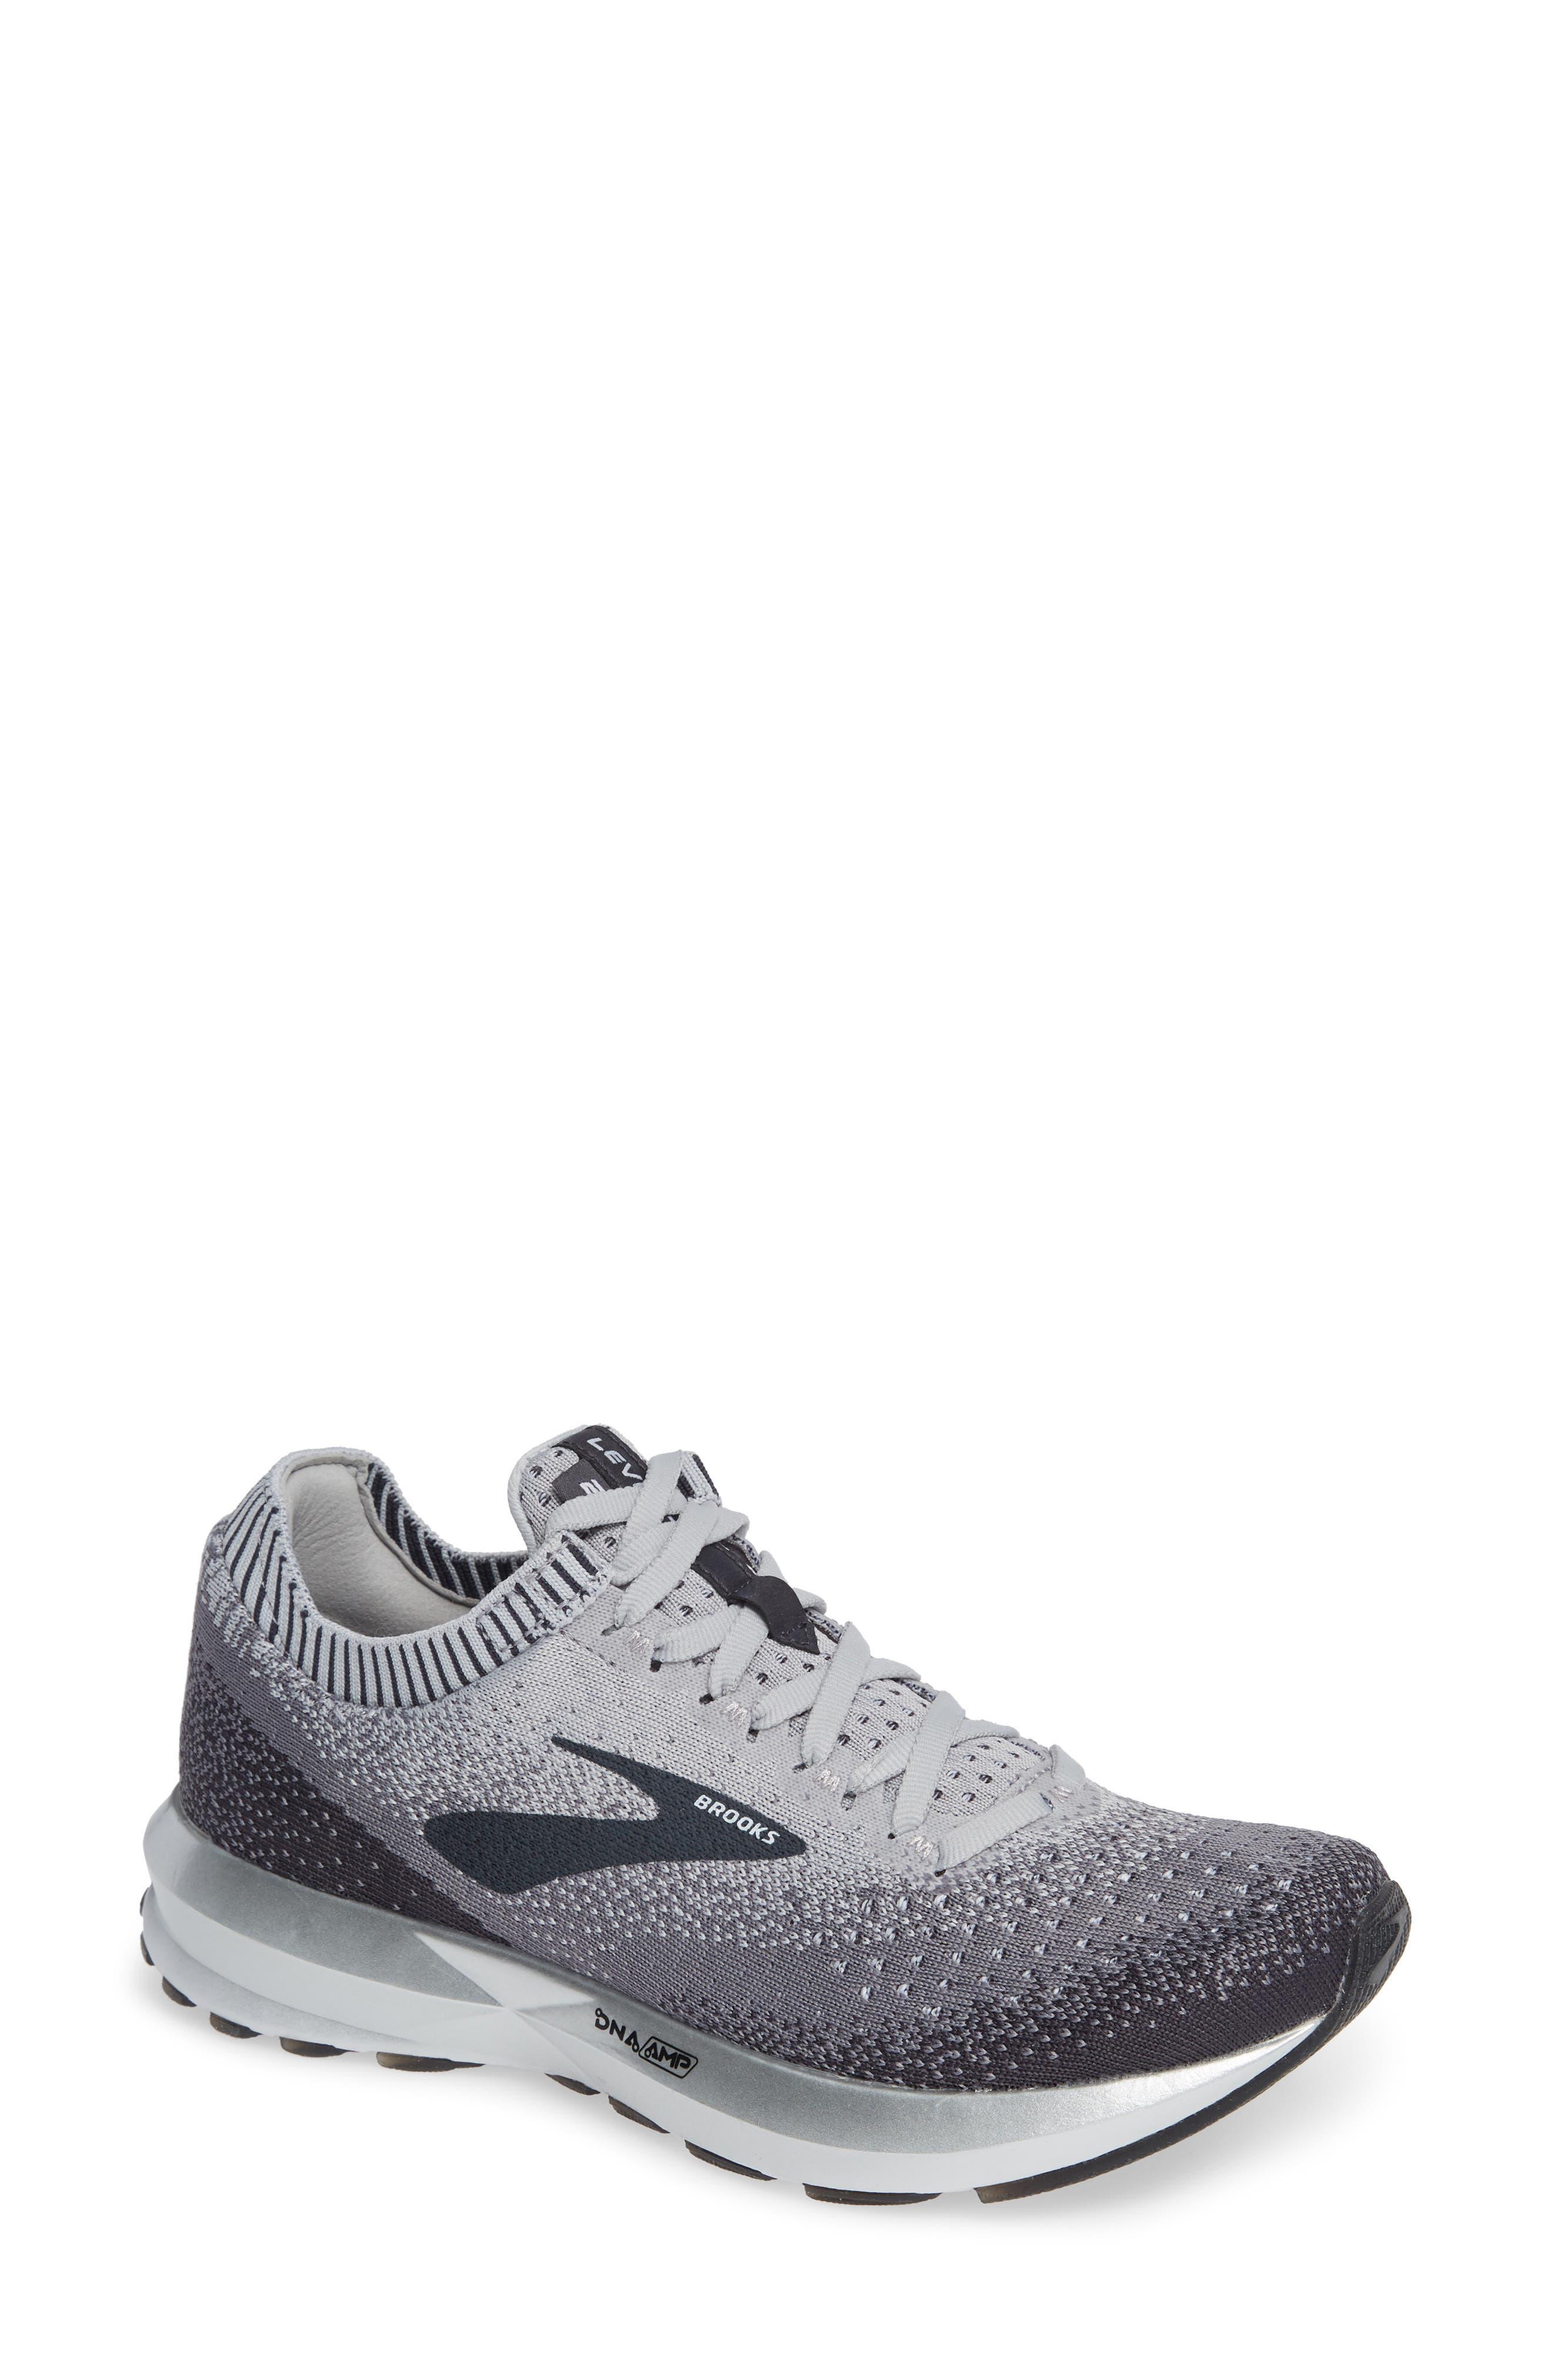 Brooks Levitate 2 Running Shoe, Grey